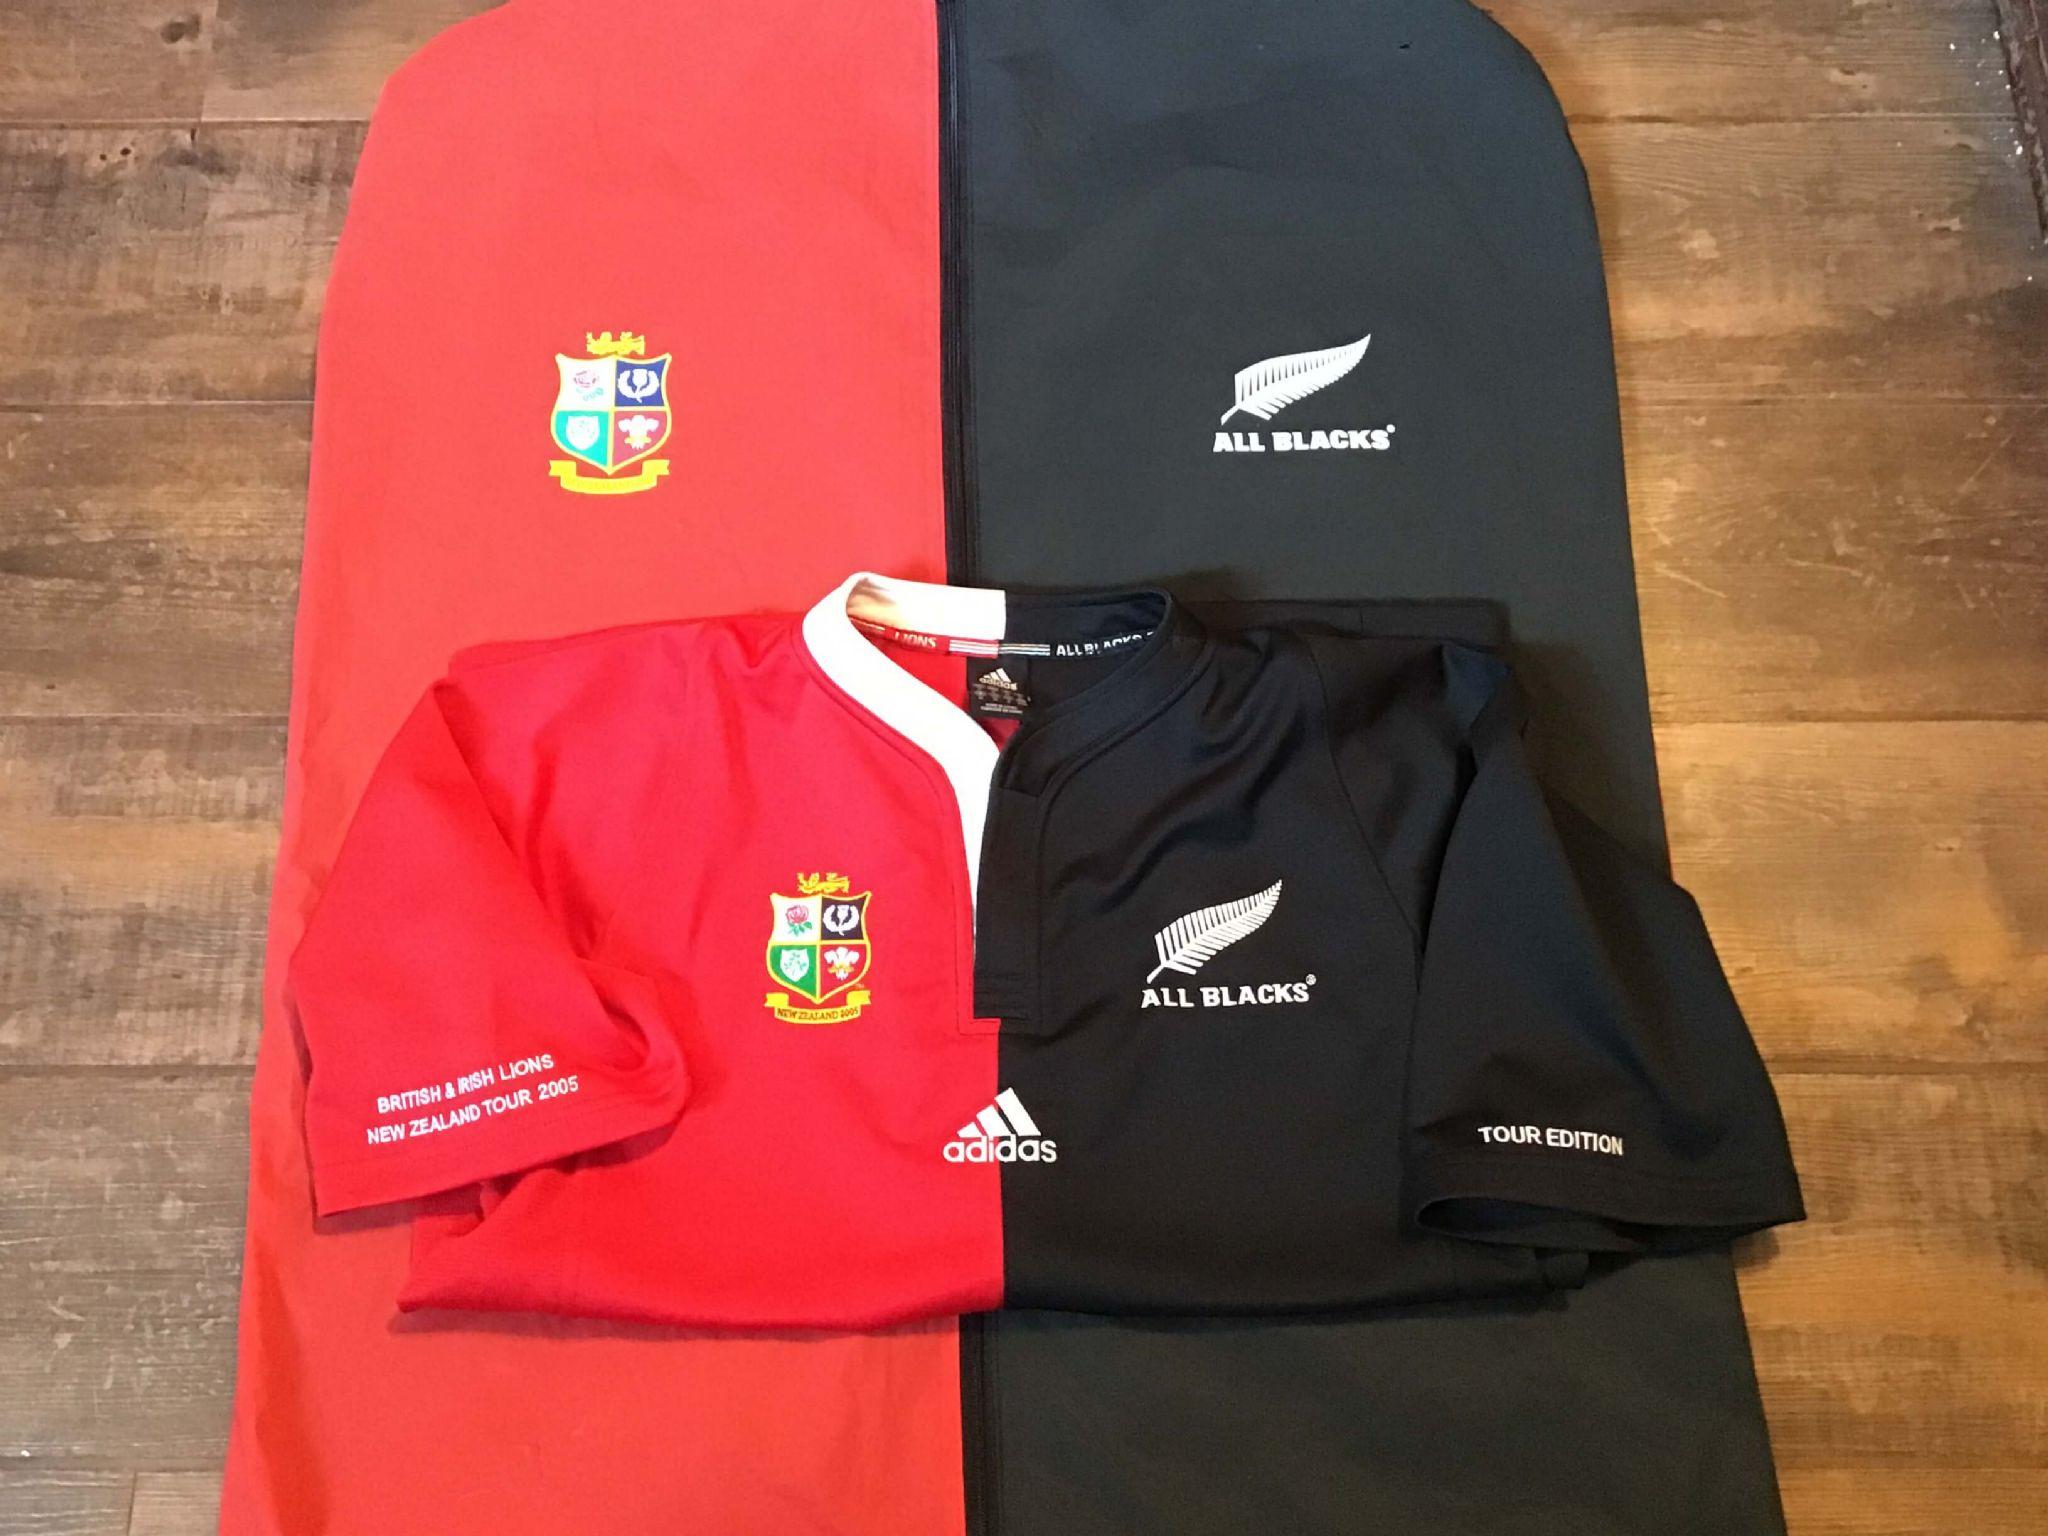 5ce05dd18b5 2005 British & Irish Lions New Zealand Ltd Edition Rugby Union Shirt &  Cover Medium